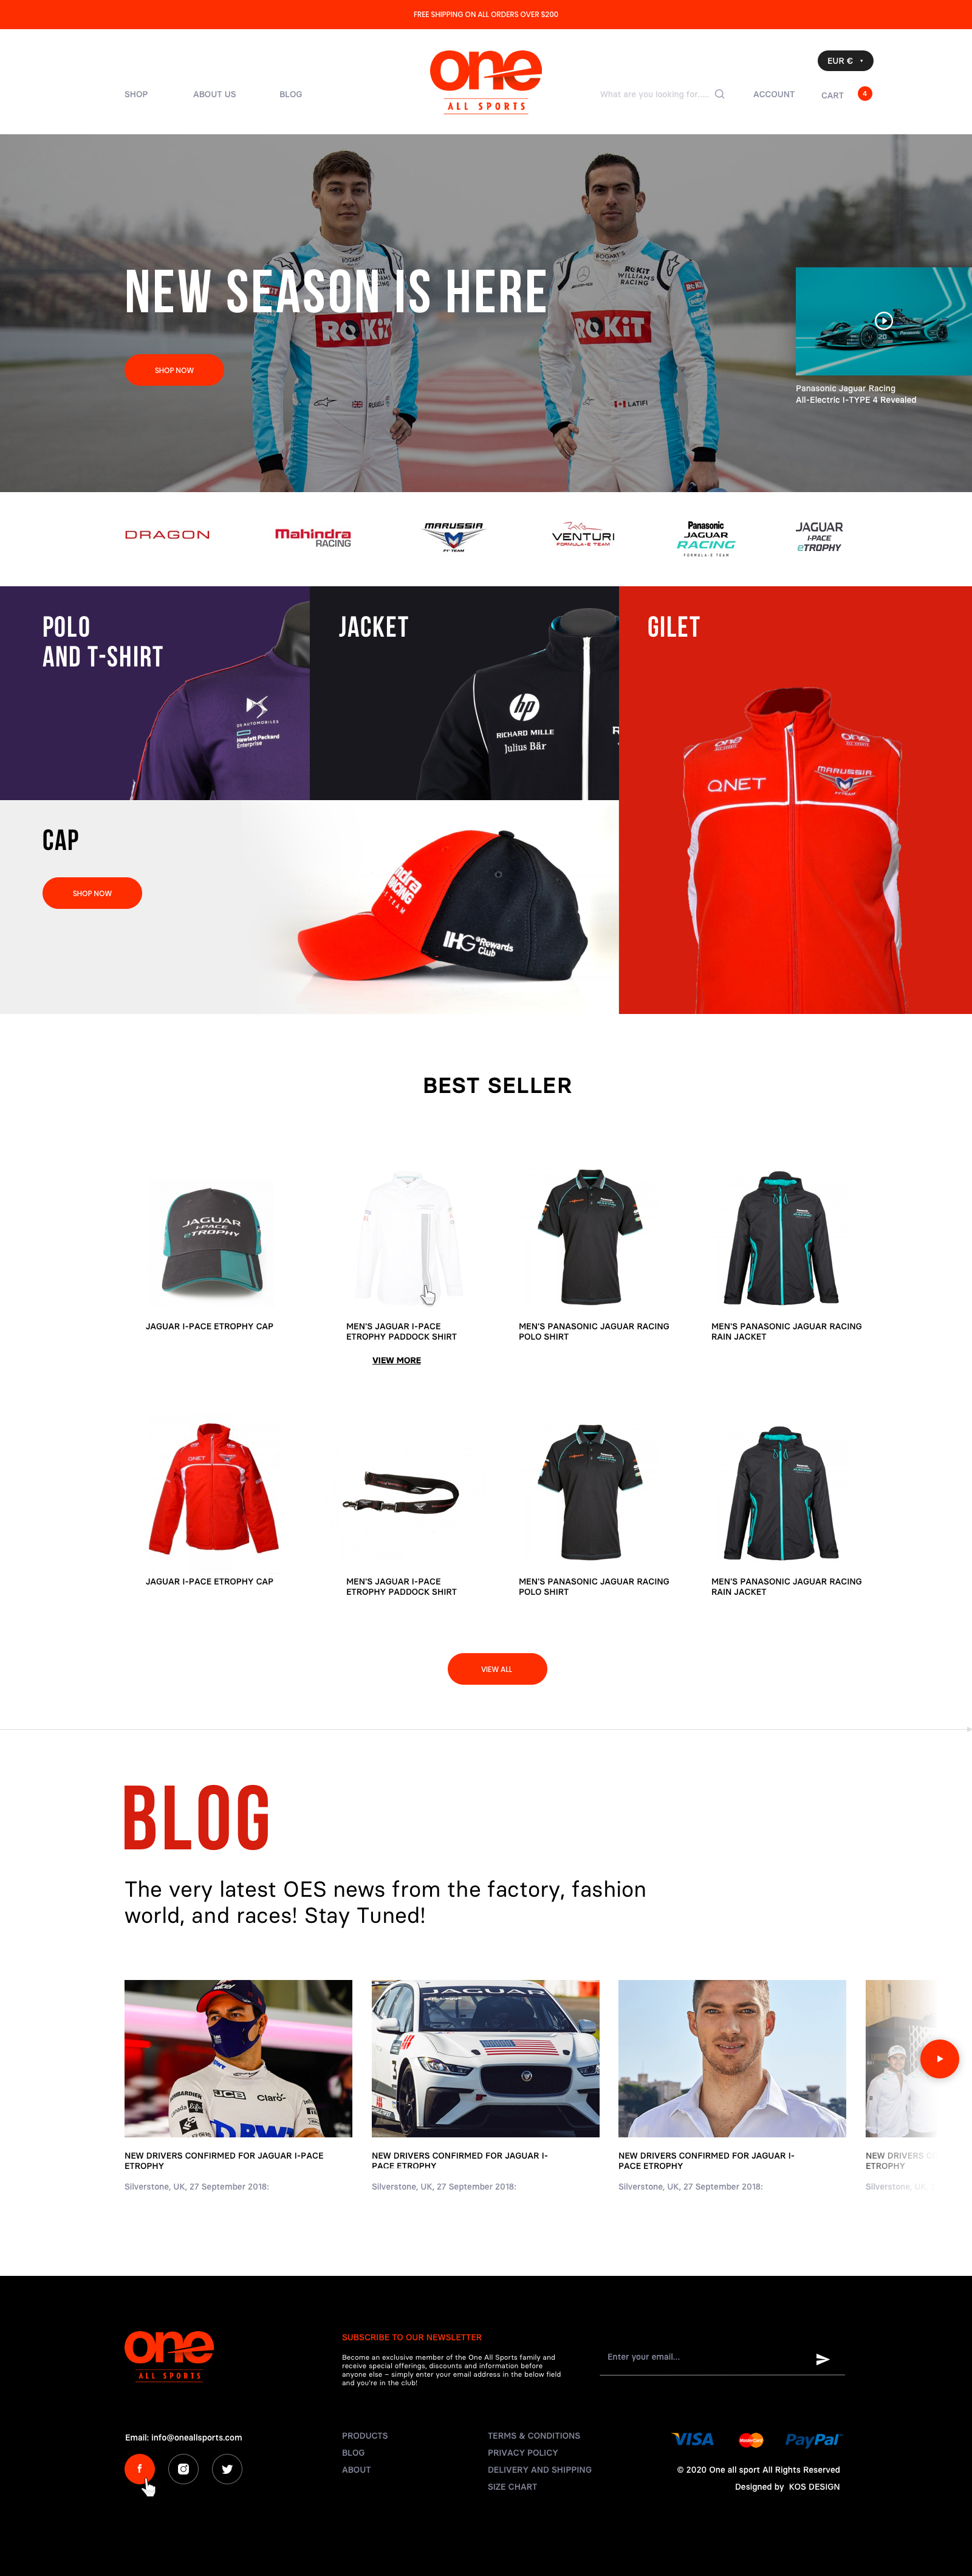 KOS Design - One All Sports